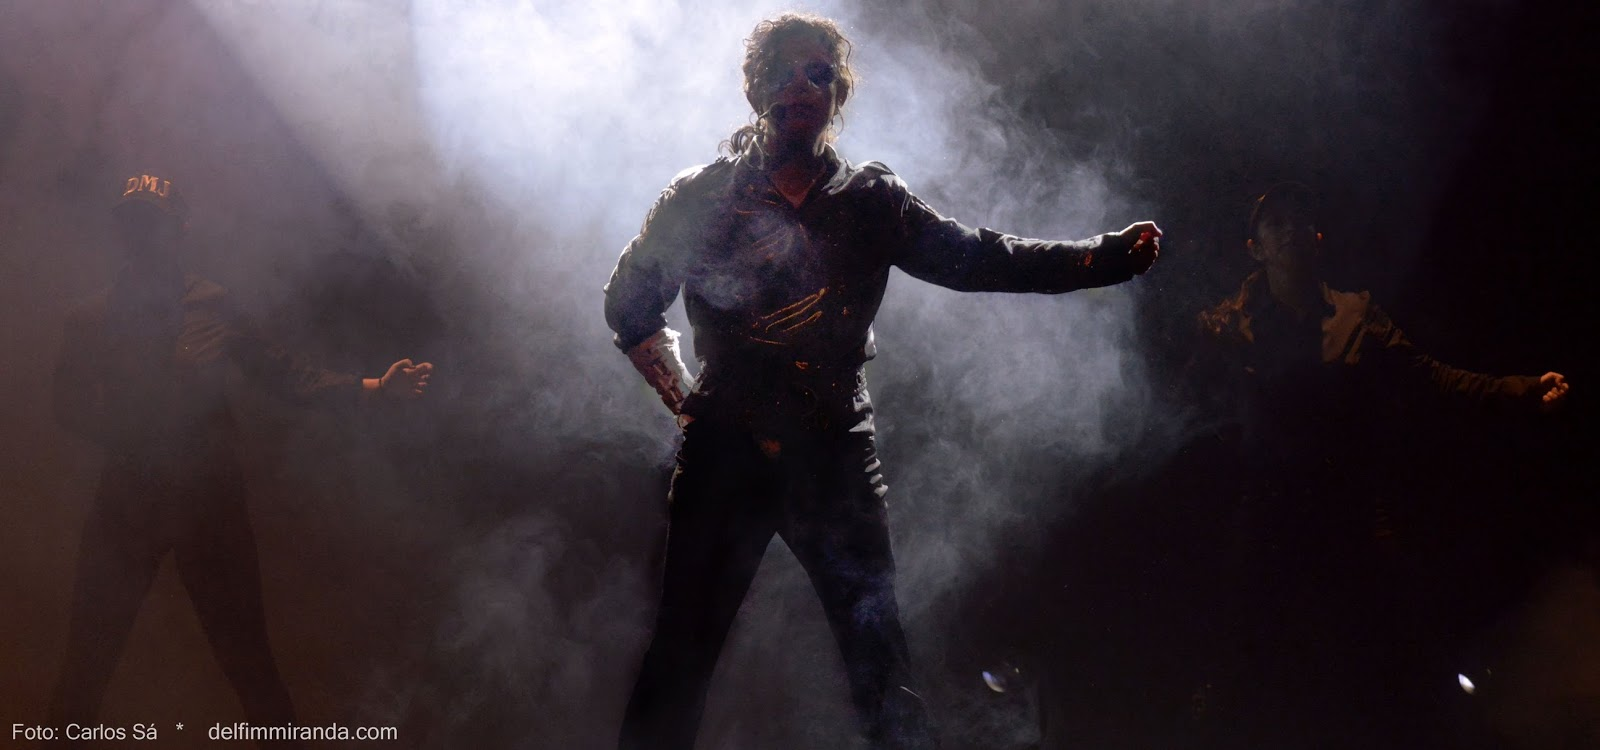 Delfim Miranda - Michael Jackson Tribute - The Drill - Start sequence of live show